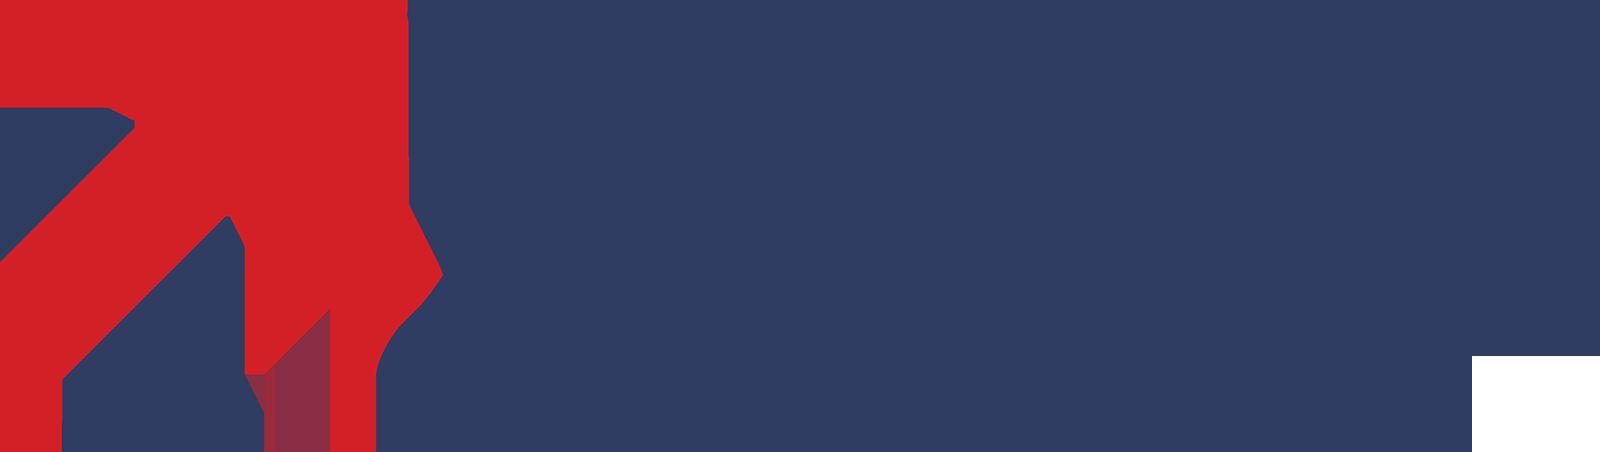 Cyber Exchange Member Logo.png